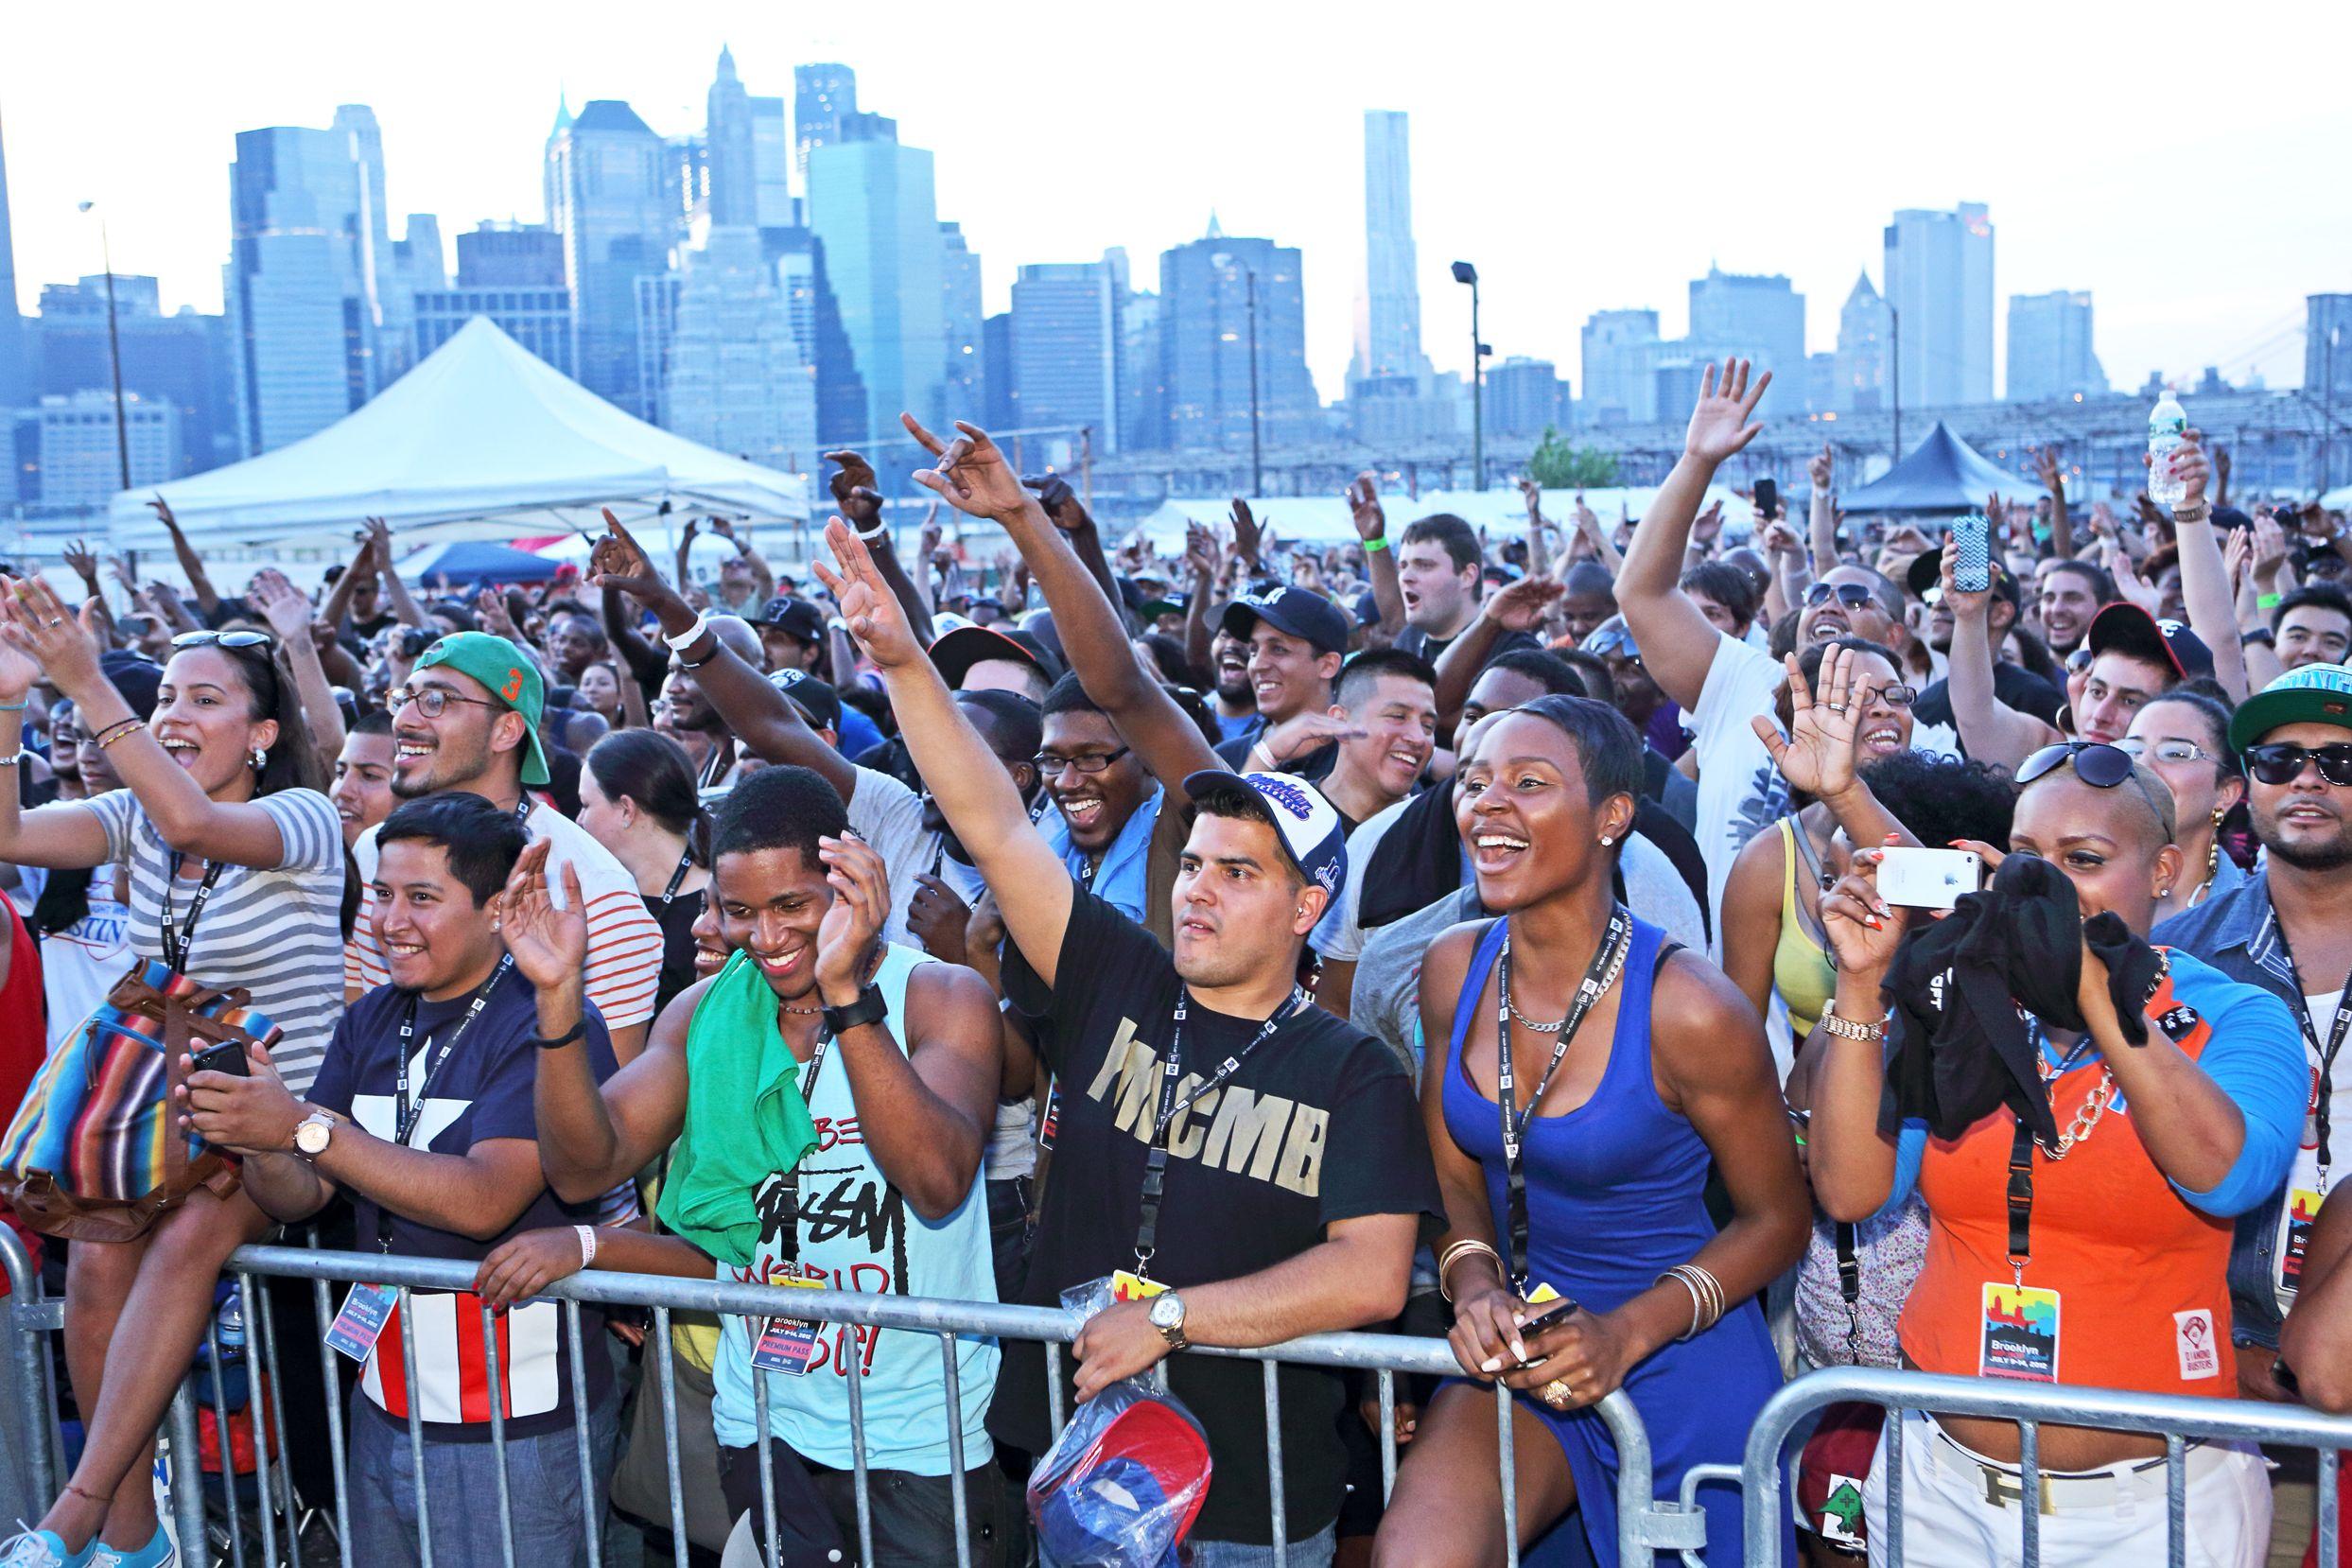 Robertadammayerbrooklynhiphopthe Brooklyn Hip Hop Festival 2012